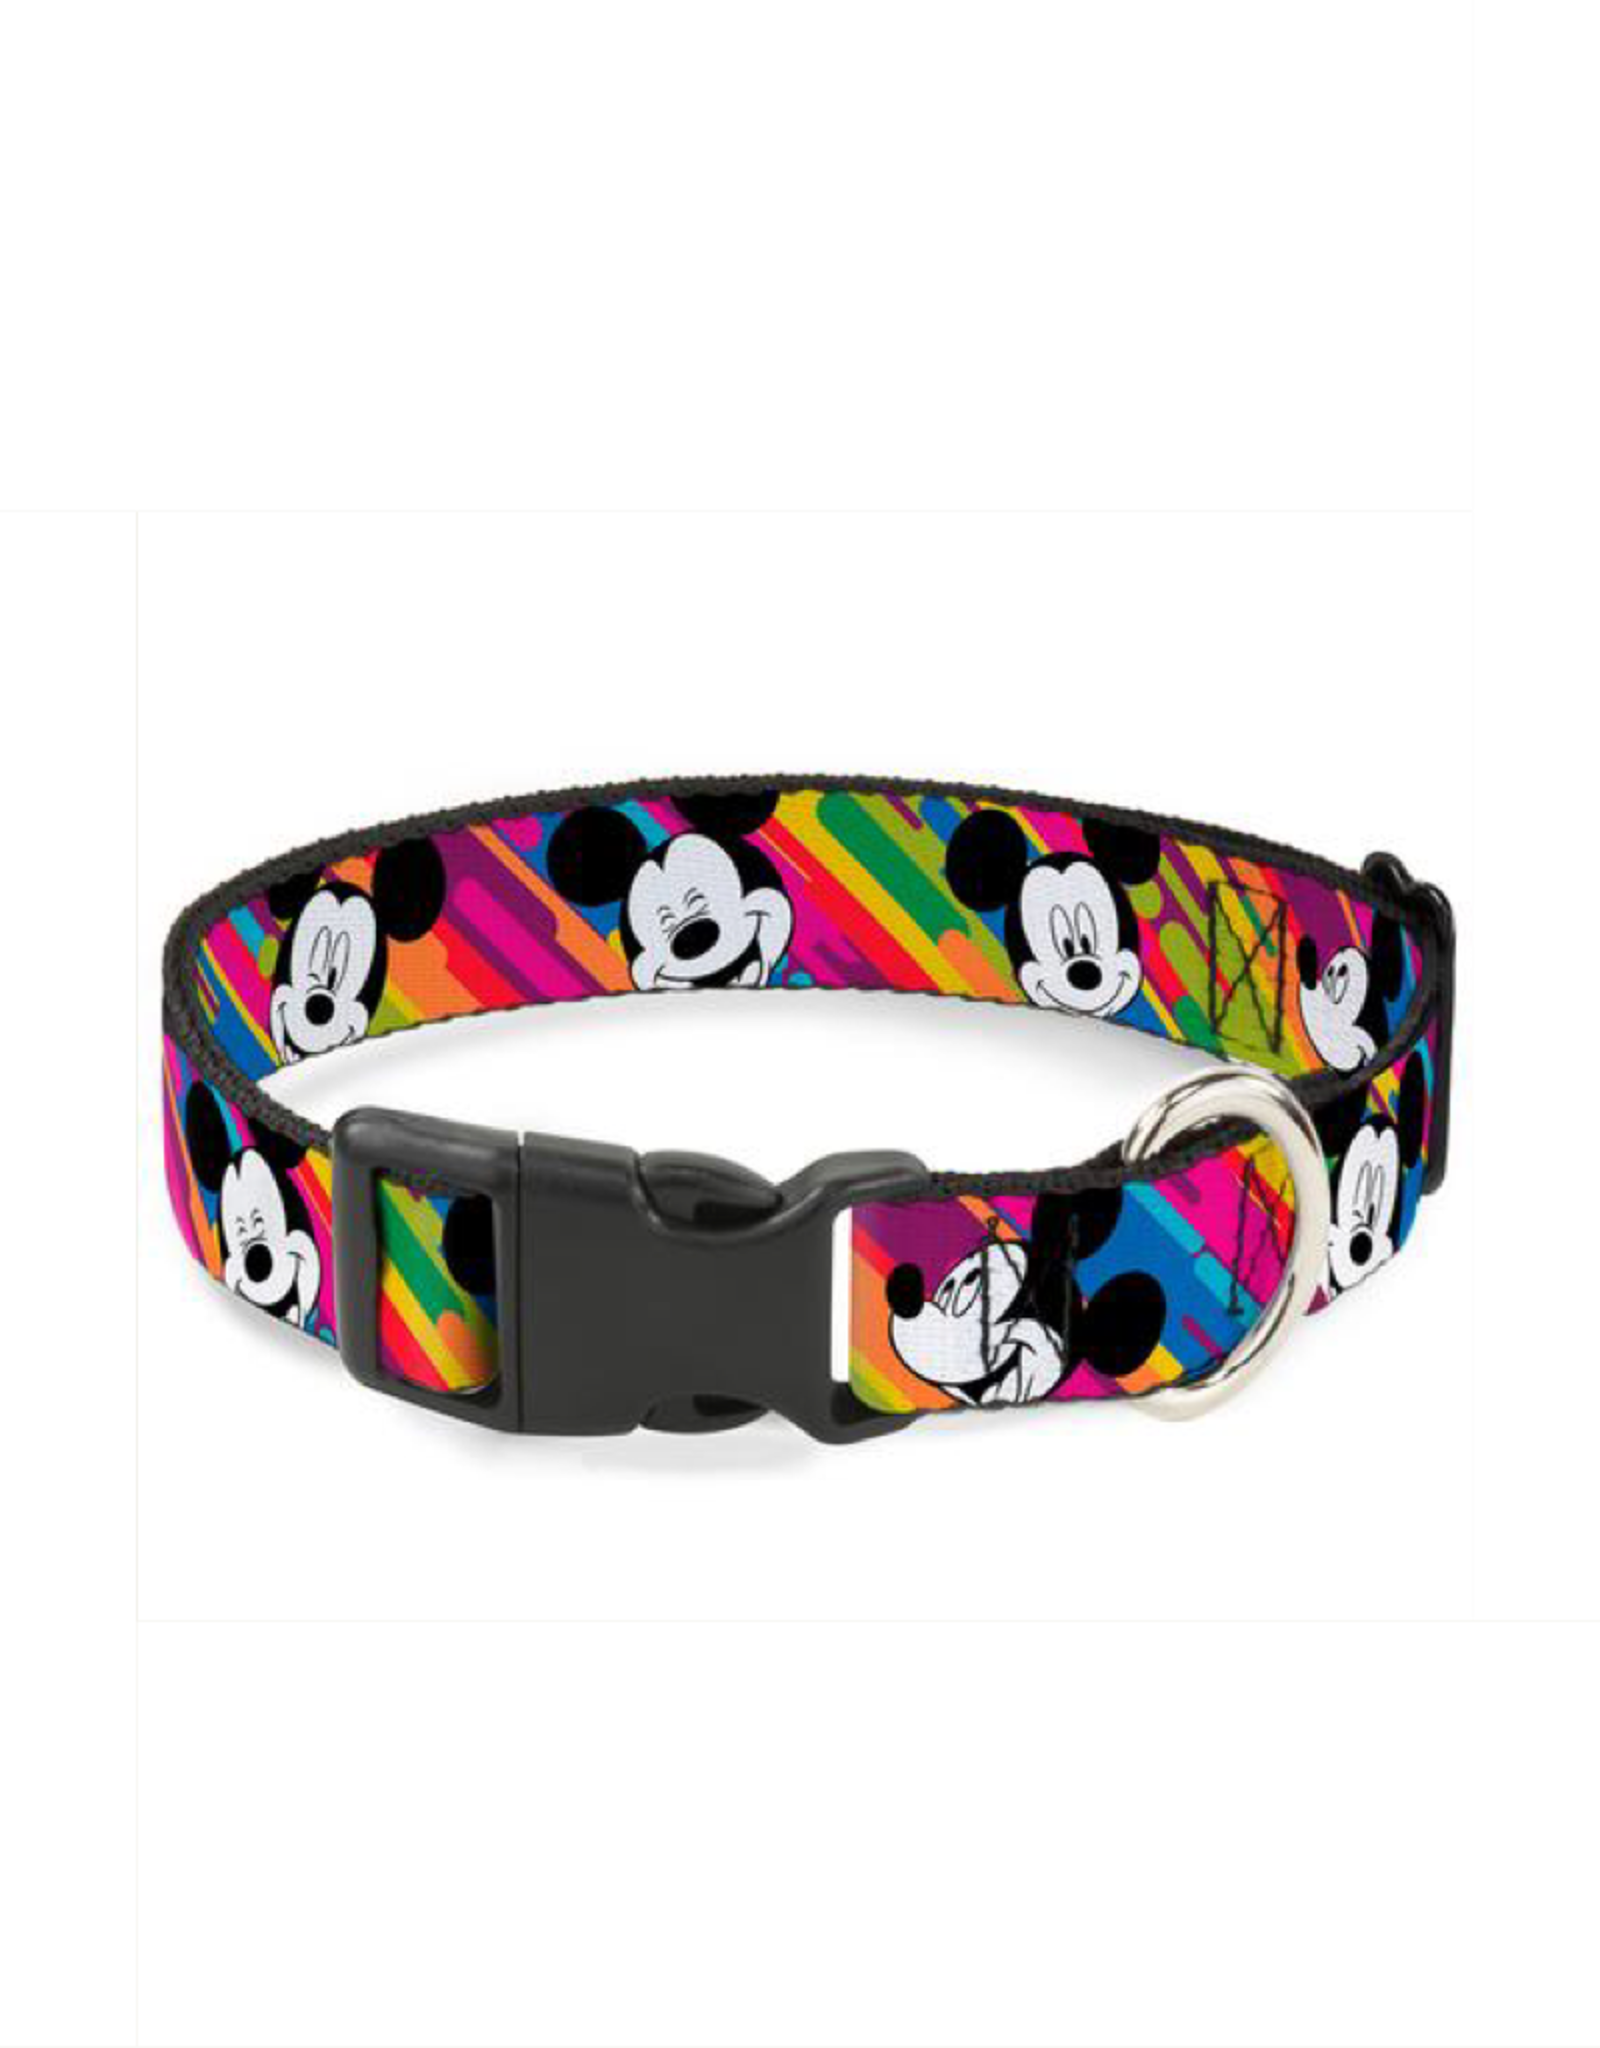 Disney Dog Collar - Shop Size Large